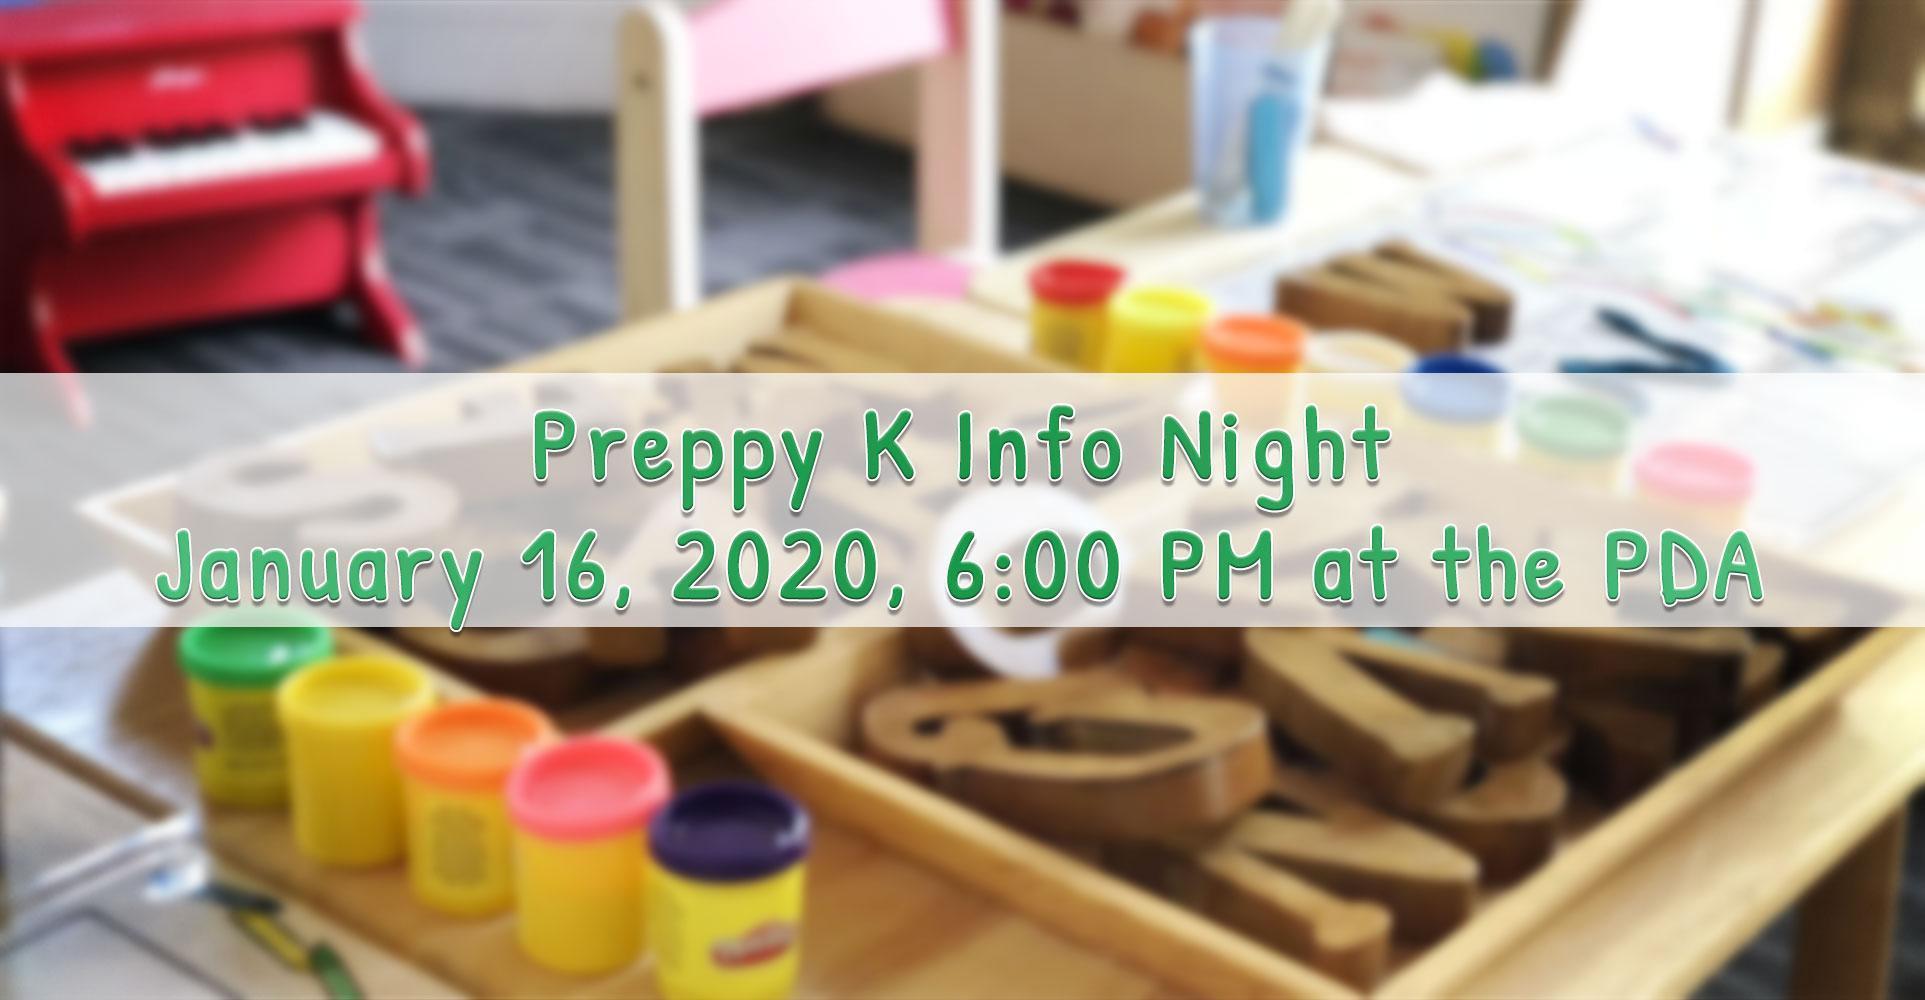 Preppy K Info Night